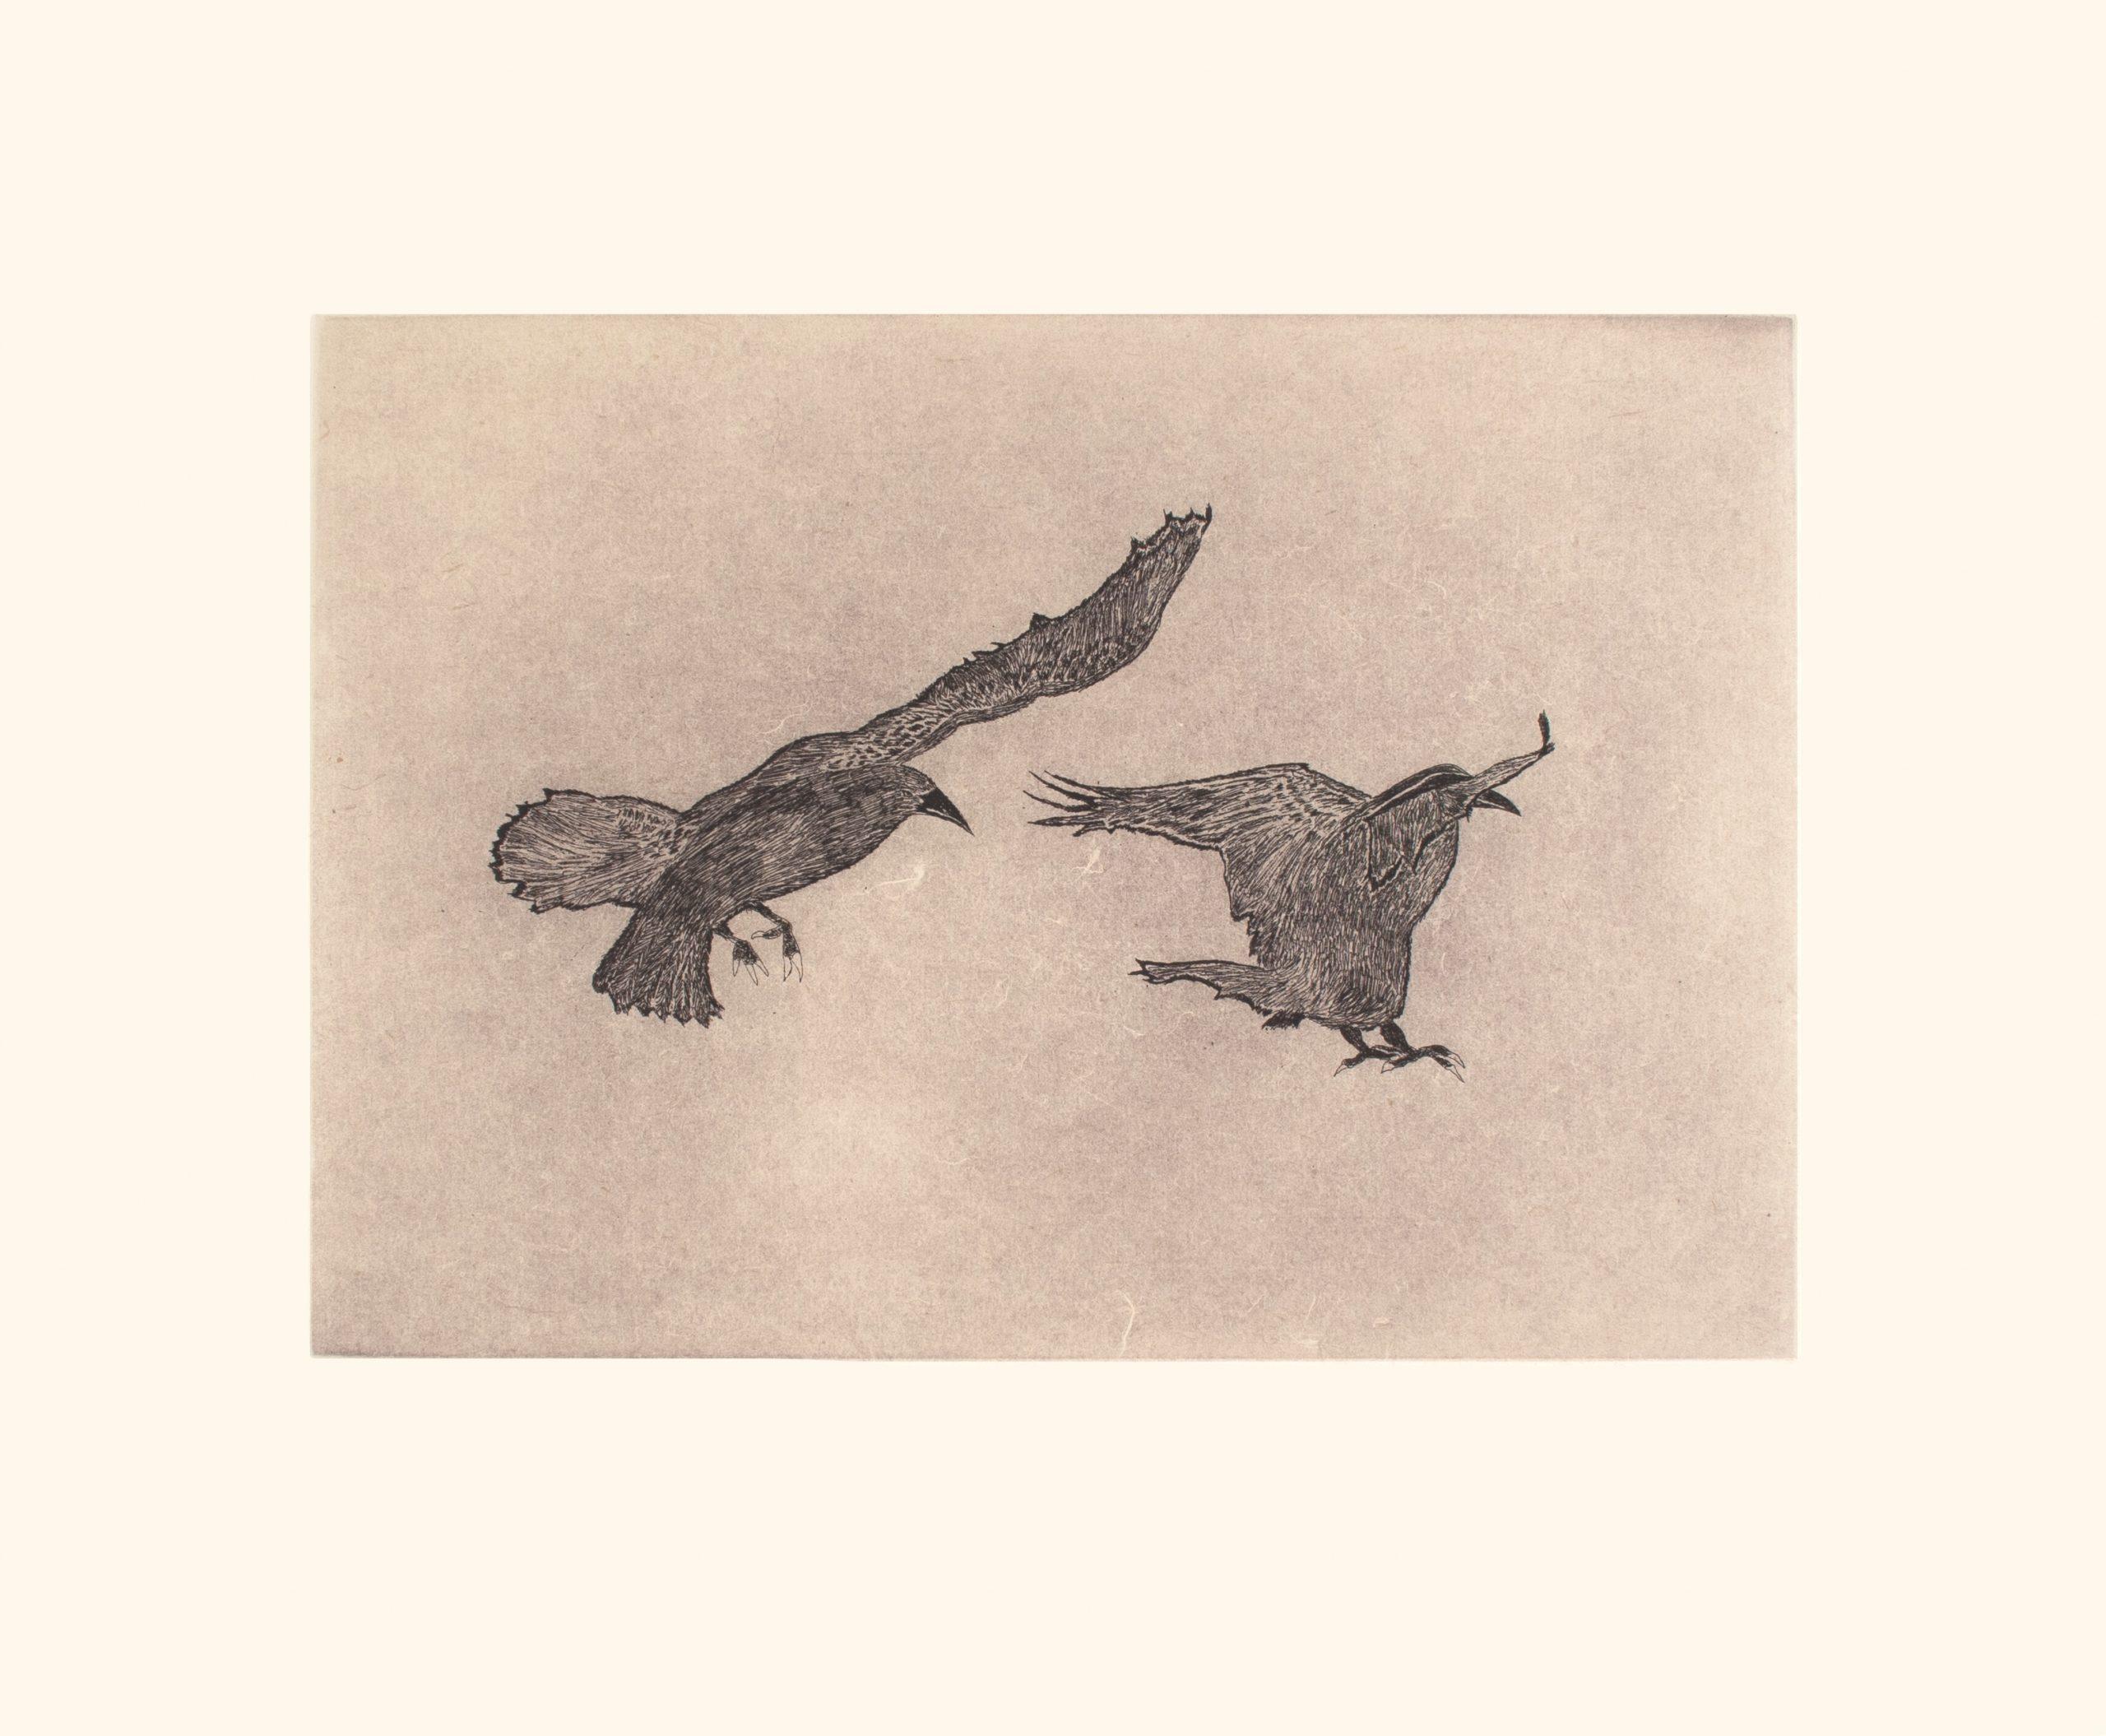 Misty Ravens by Olooreak Etungat